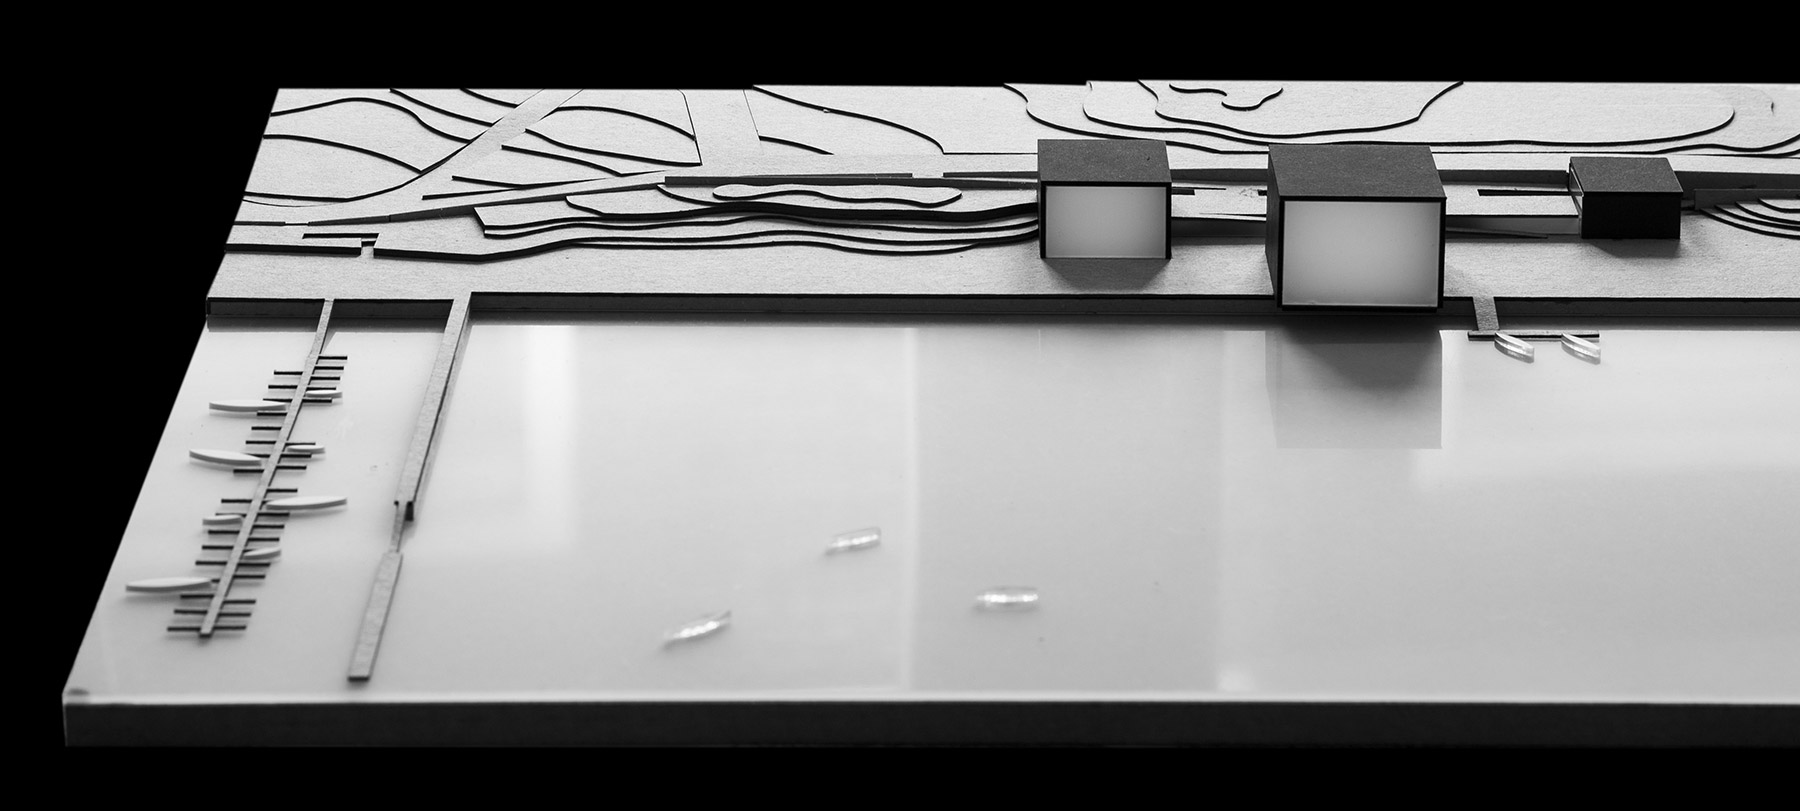 maqueta-arquitectura-architecture model-pfc-CEU-Museo-Fluvial-arquimaqueta (7)